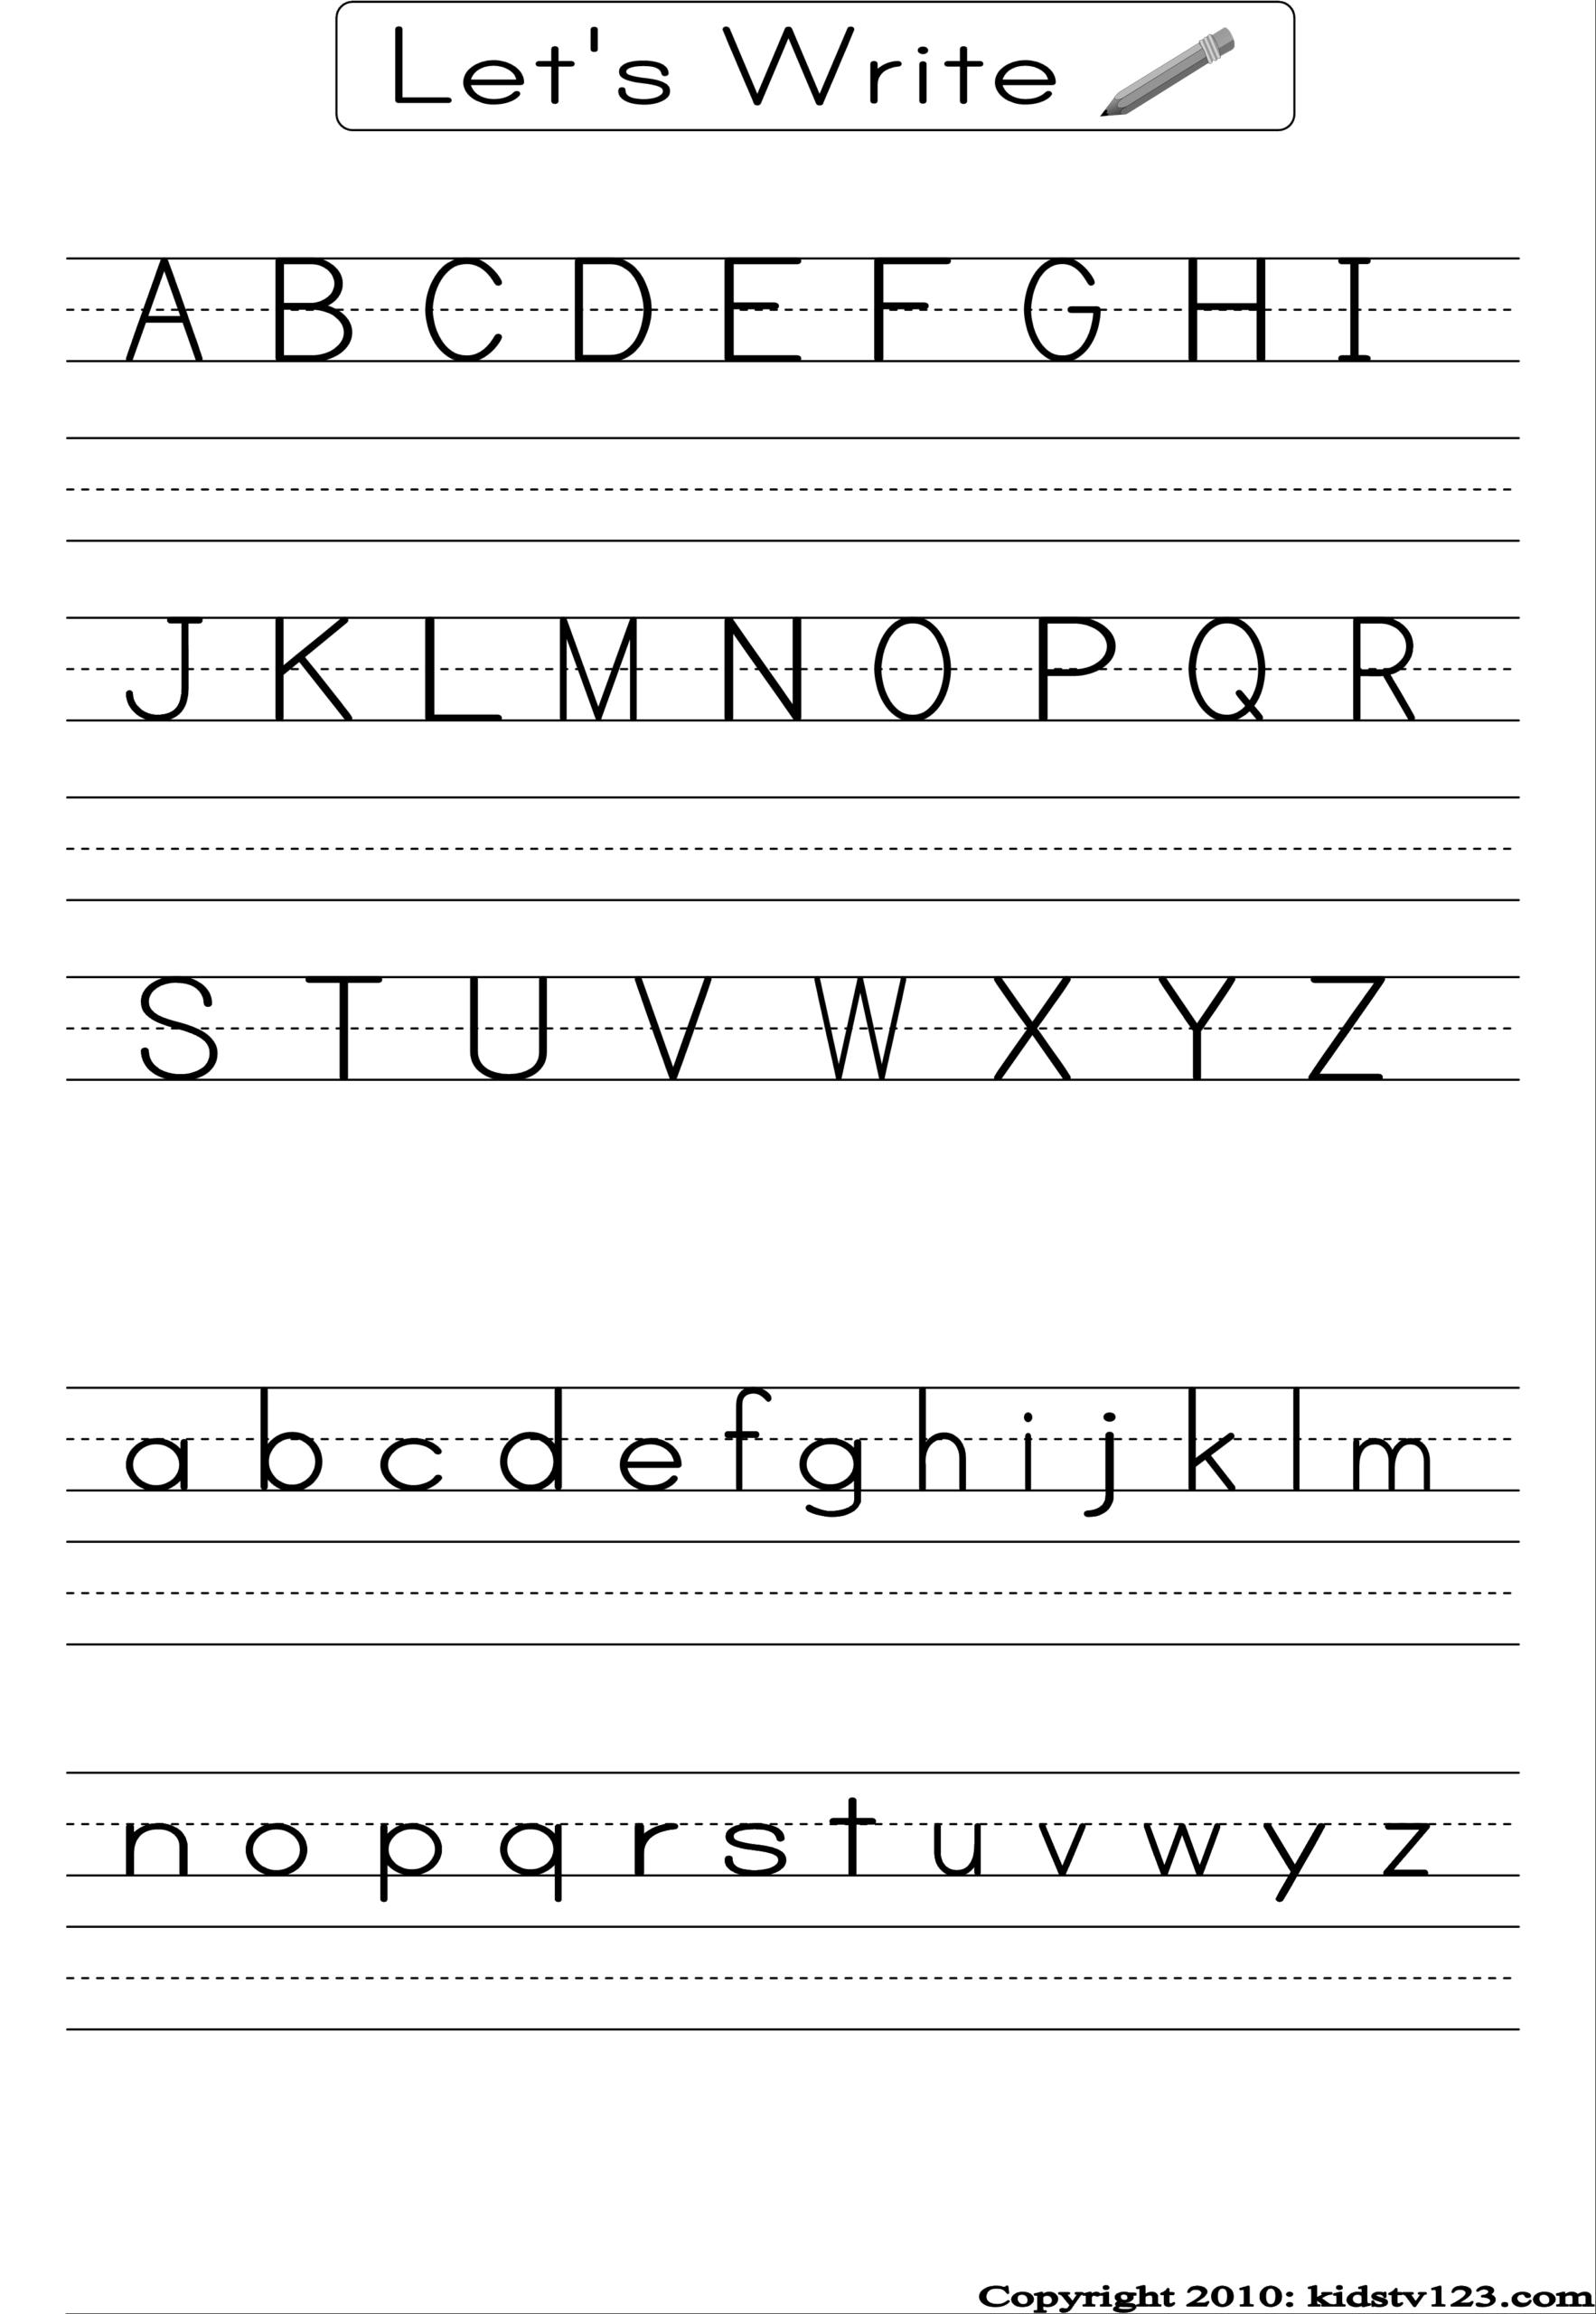 Alphabet Writing Practice Sheet   Alphabet Writing Practice within Alphabet Handwriting Worksheets Printable